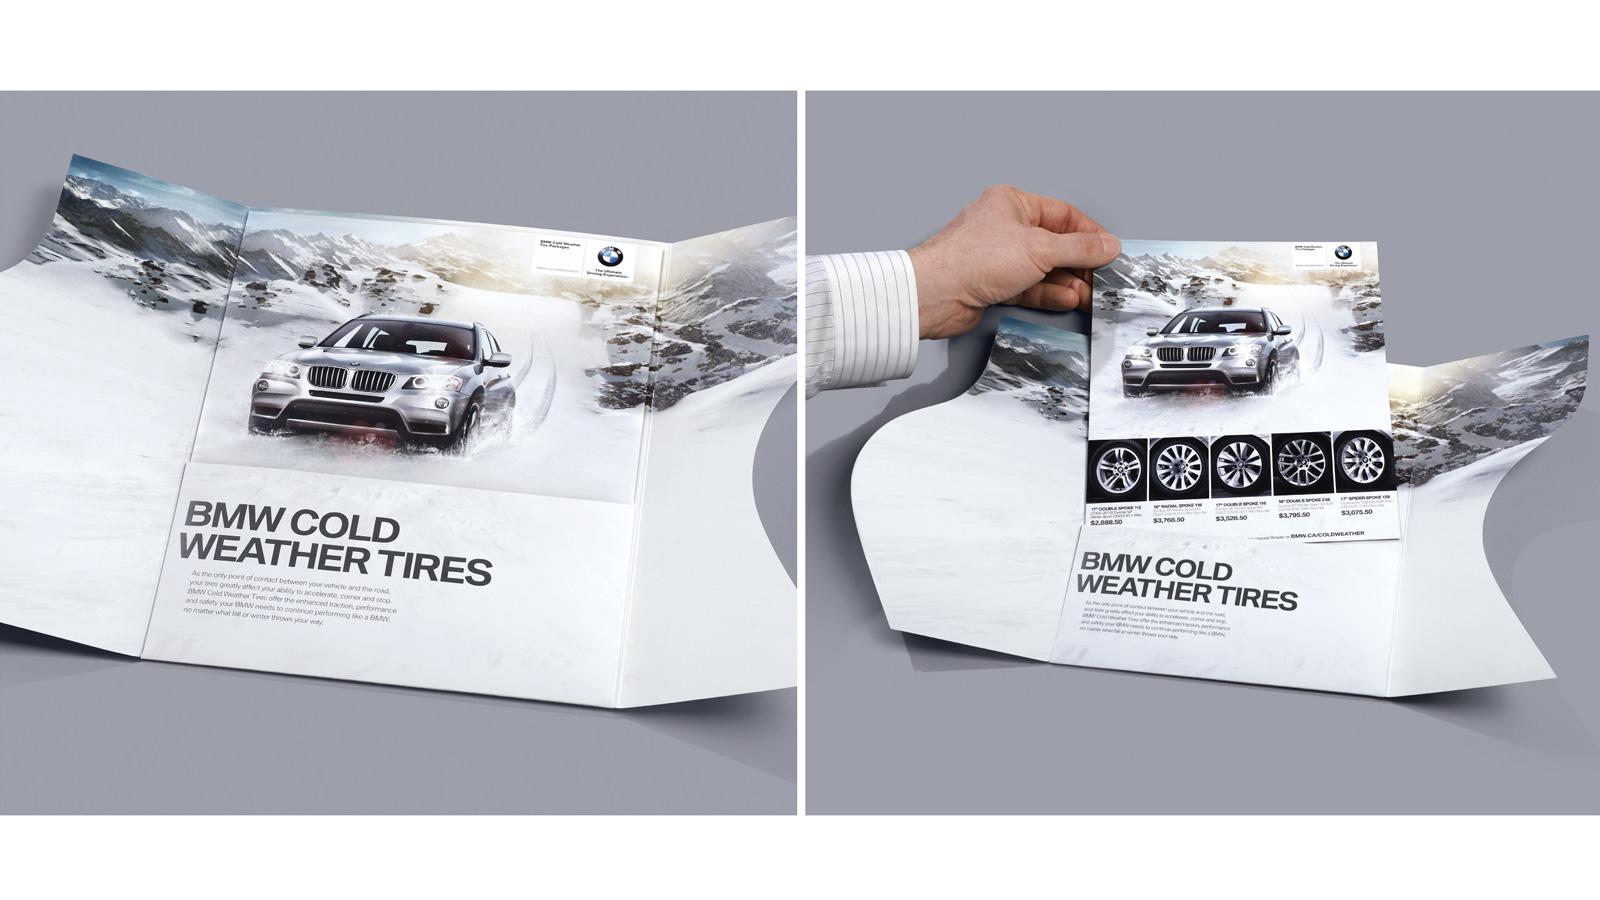 BMW Canada   Envoi direct cutting through   Automobile, Imprimé, Marketing direct, Promotion